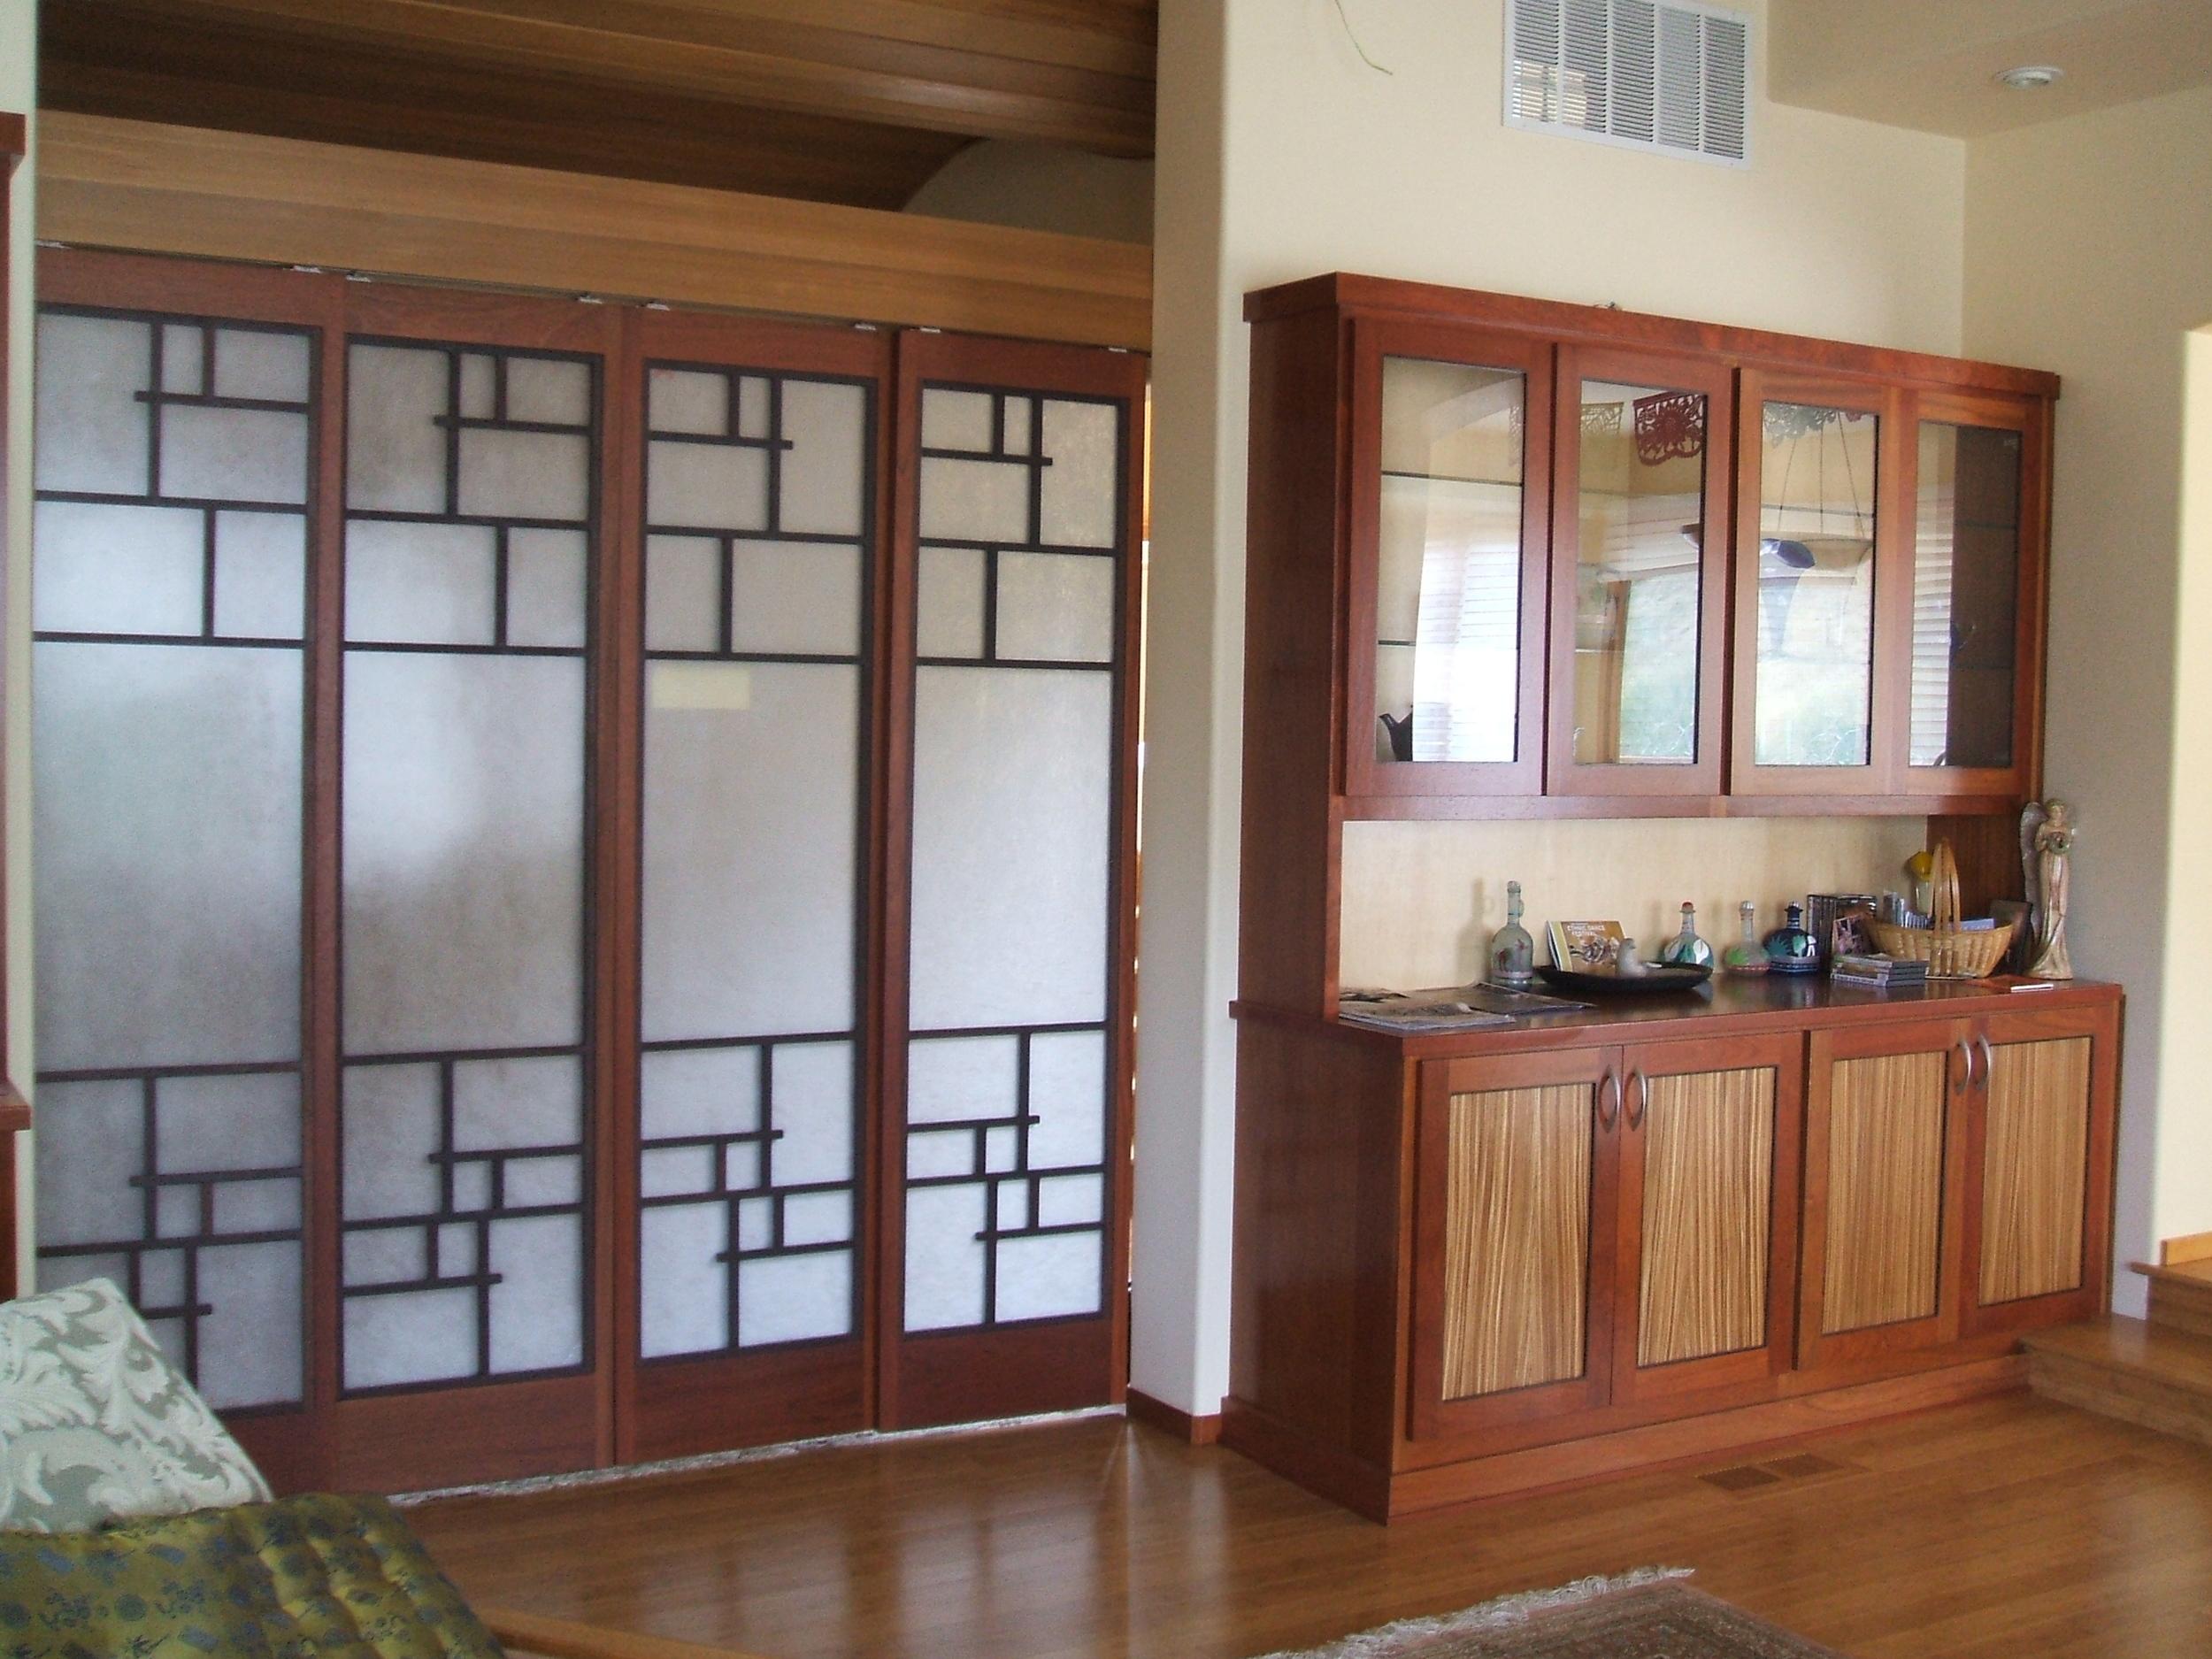 Custom Soji screens in Jatoba and Wenge with rice paper panels